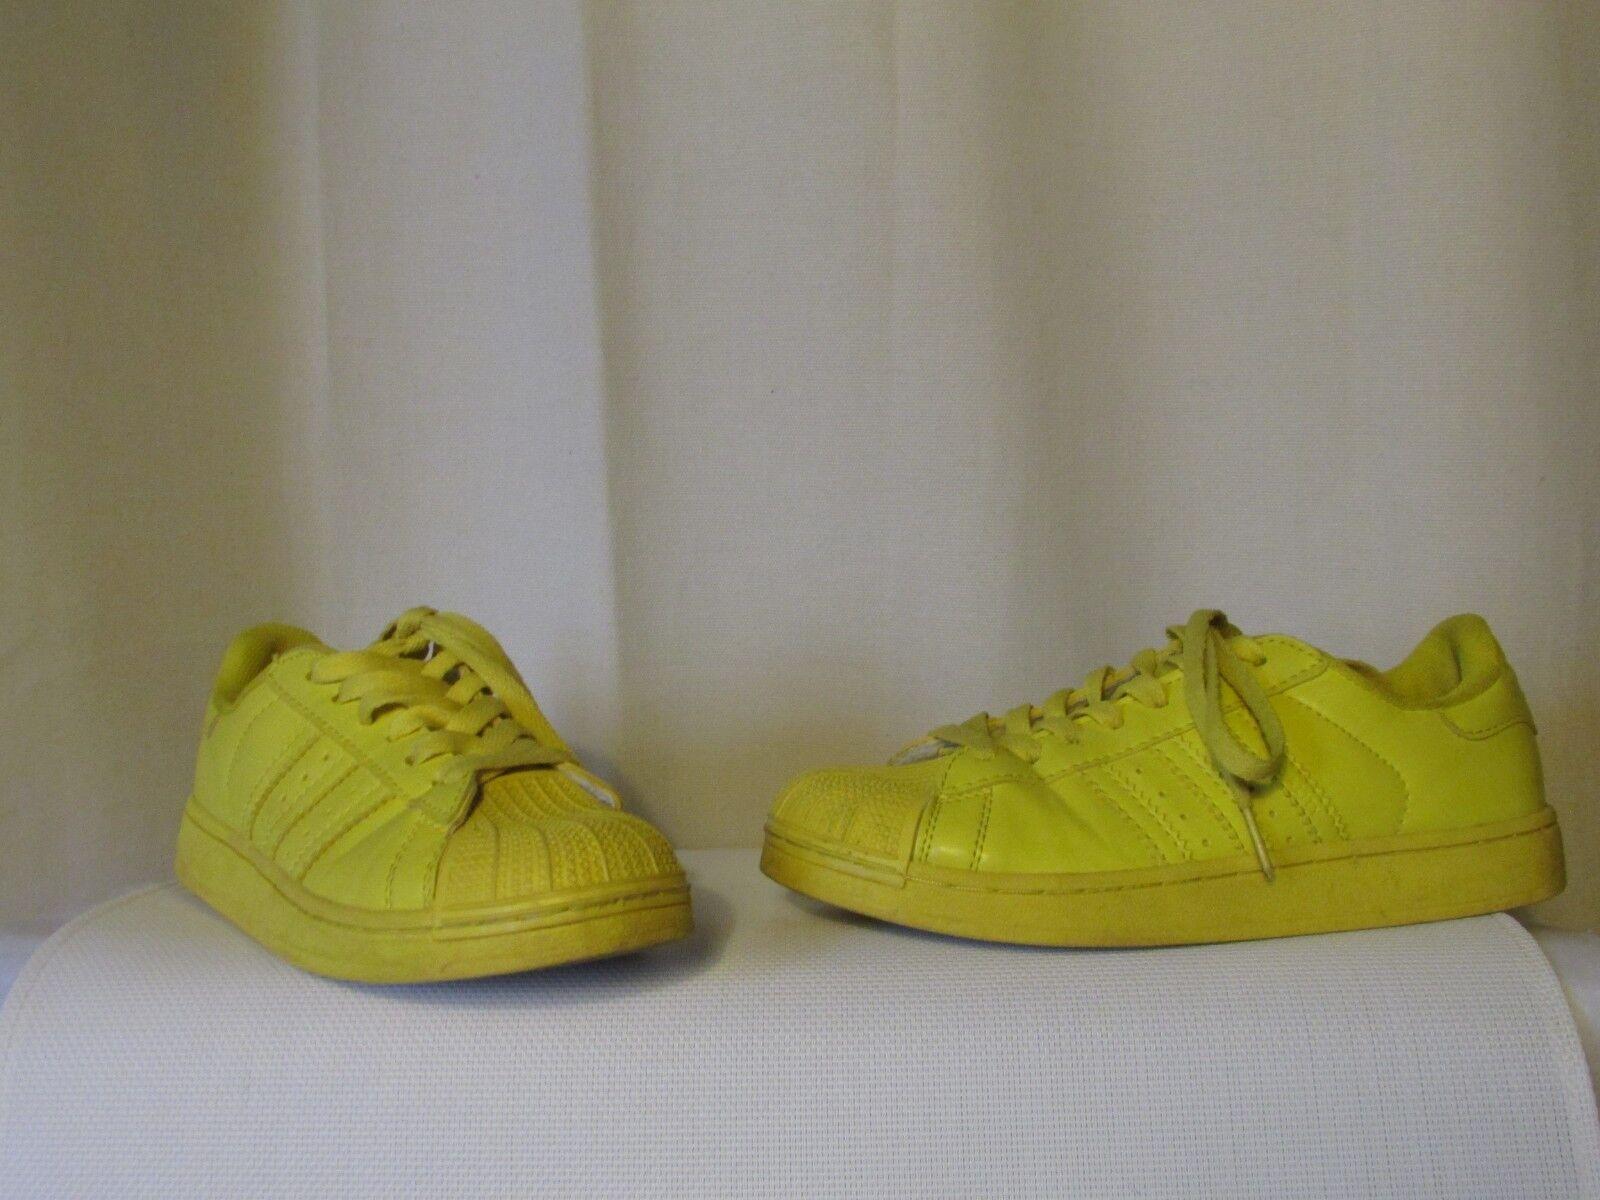 Zapatillas superstar adidas pharrell williams cuero amarillo talla 39 1 1 1 2  A la venta con descuento del 70%.